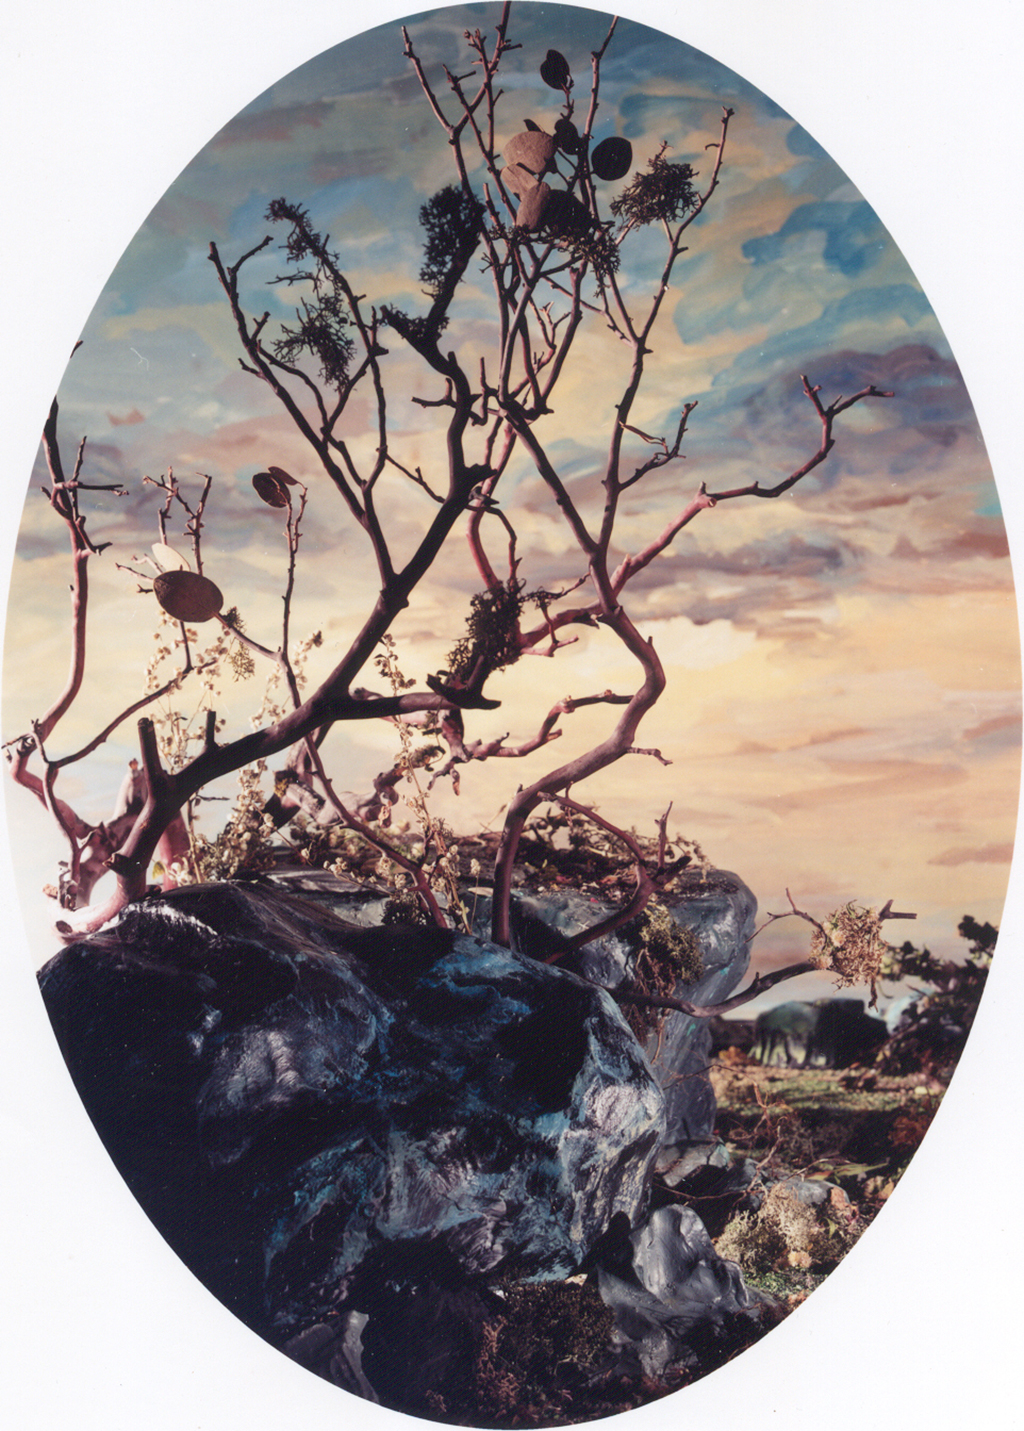 Grace, 2002, chromogenic print, 153 x 109 cm edition of 5